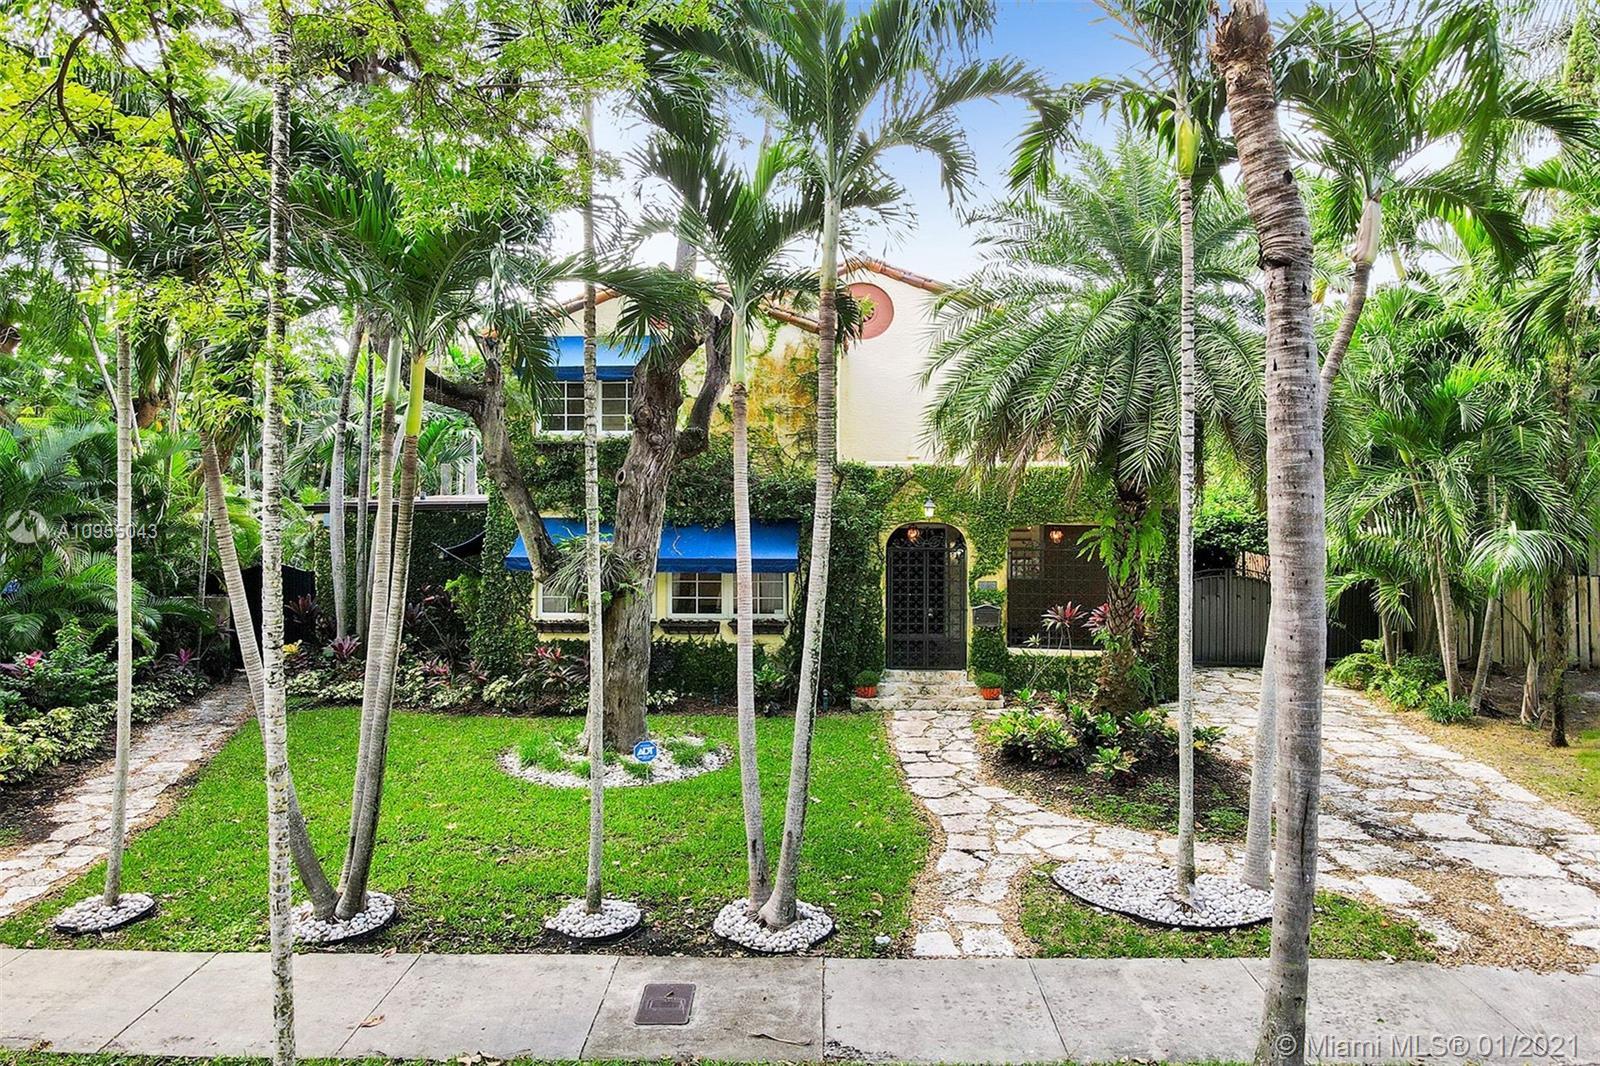 Morningside - 5968 NE 6th Ct, Miami, FL 33137